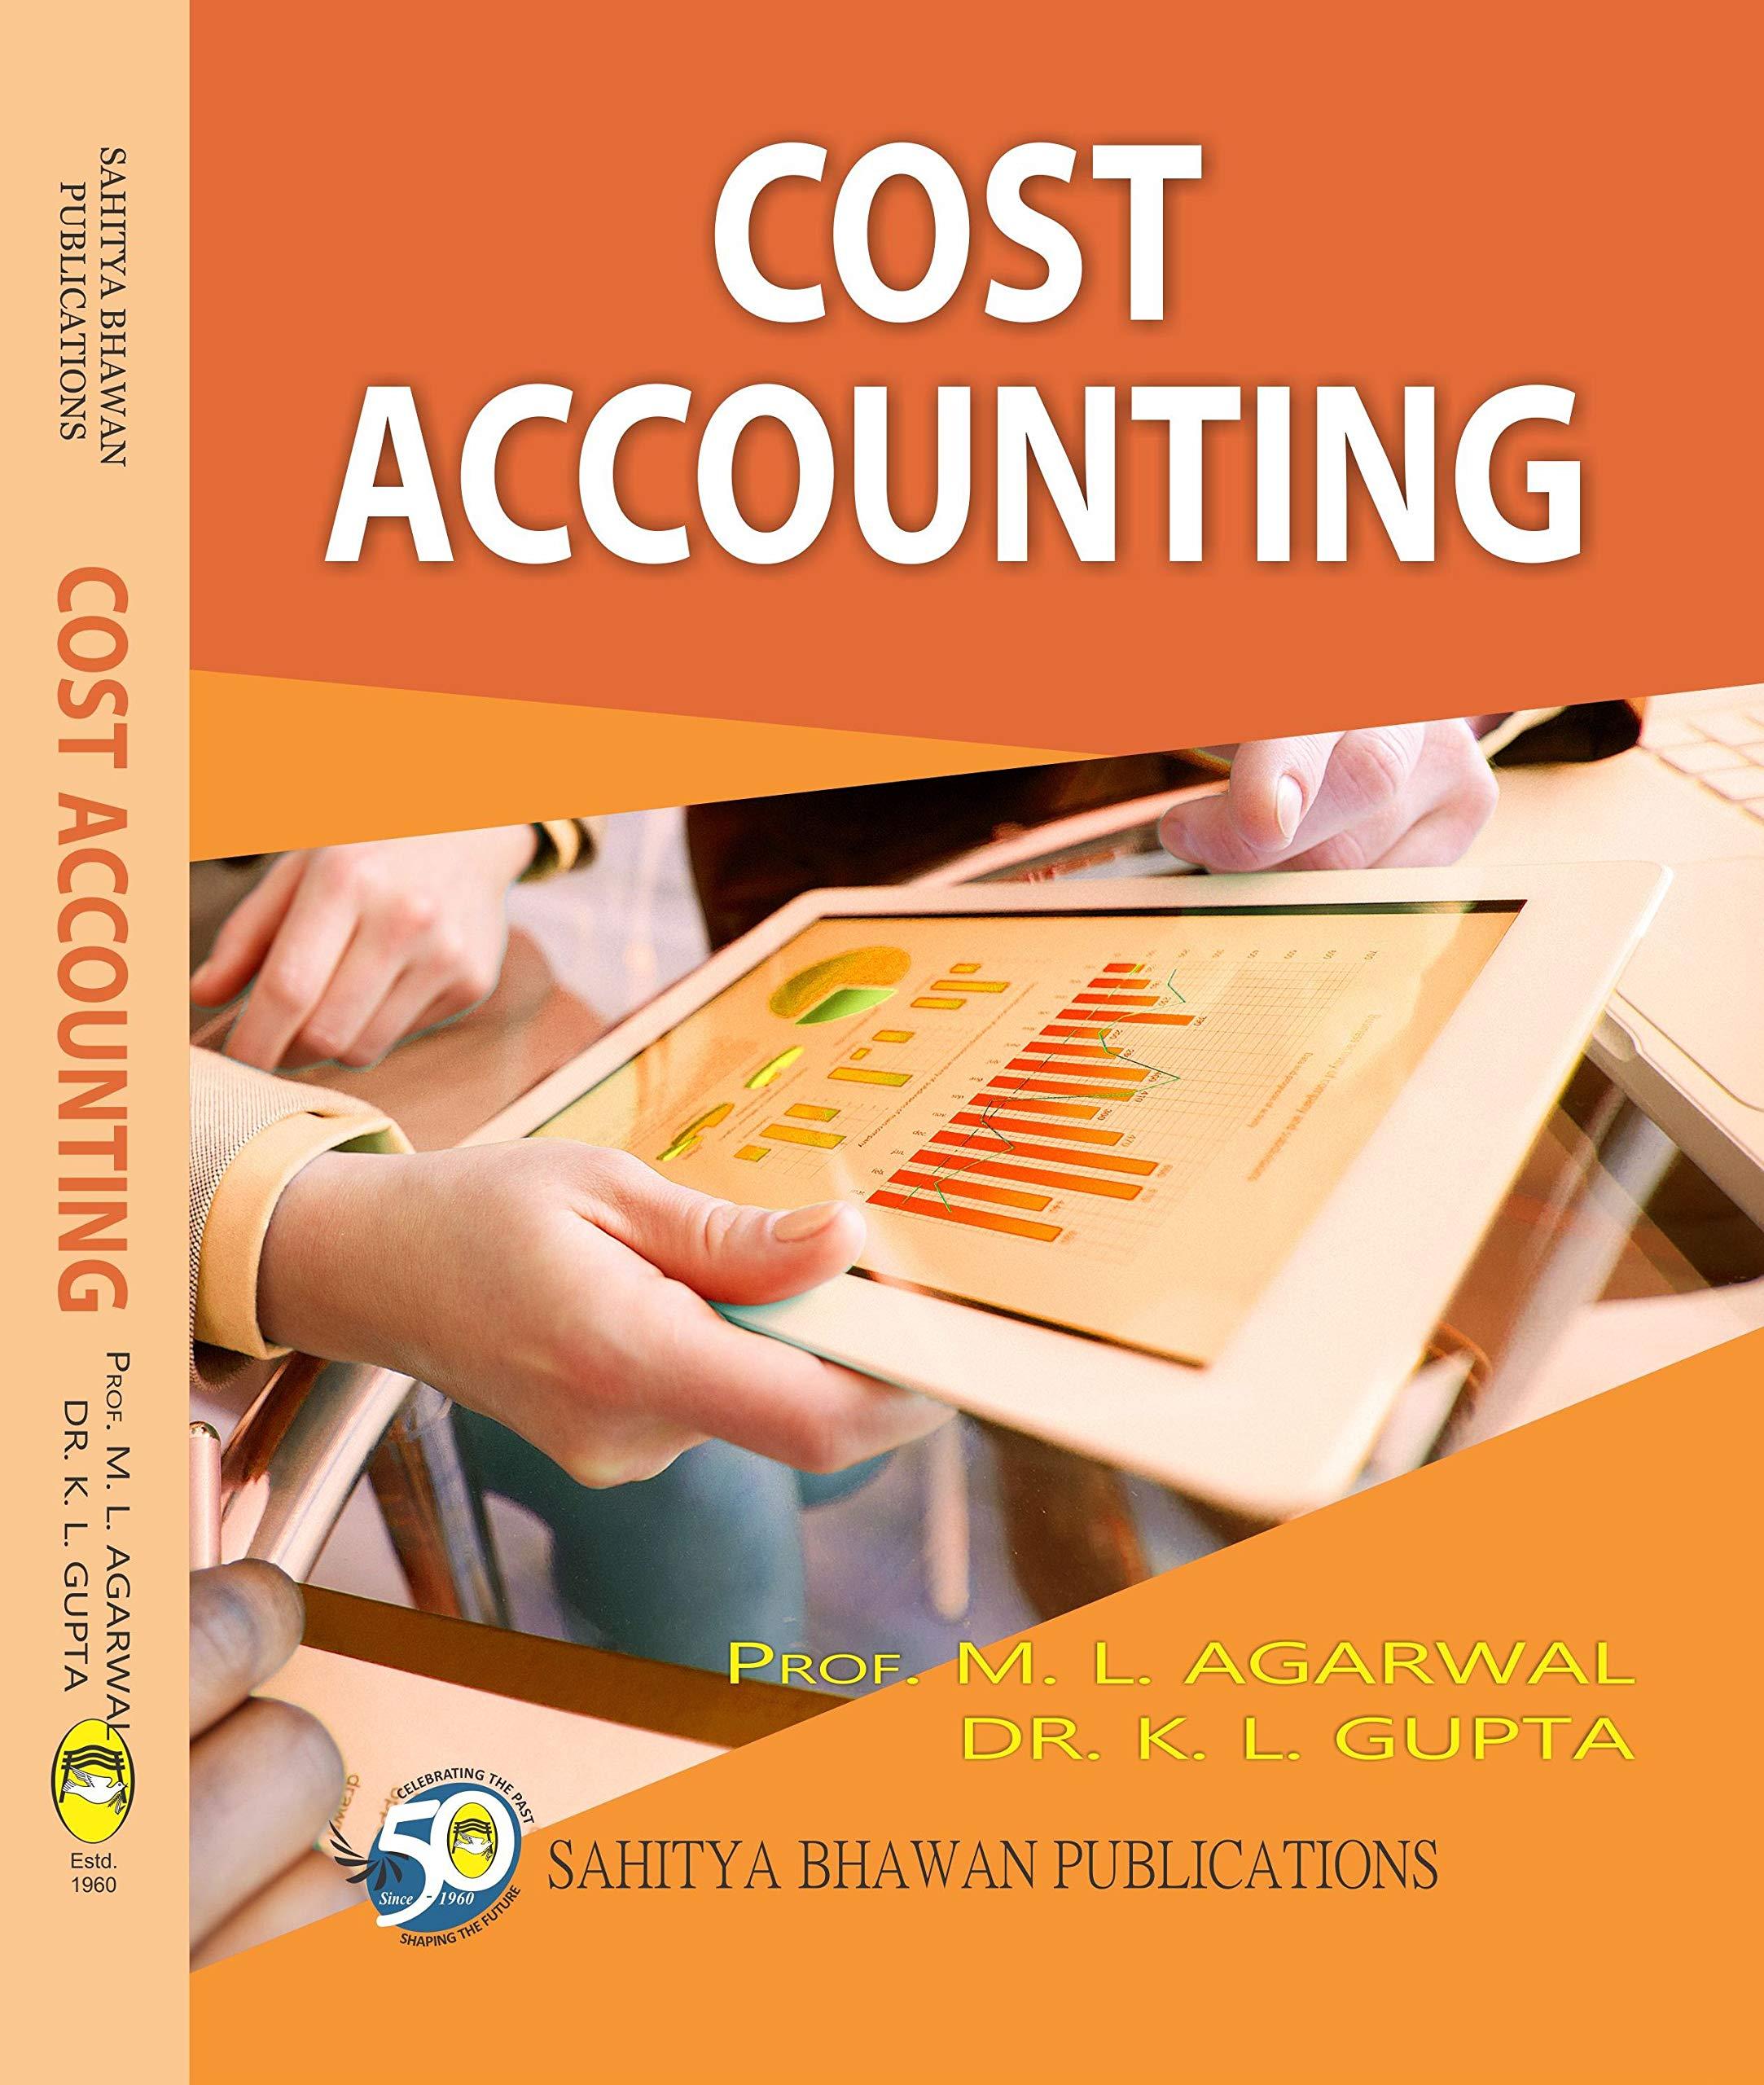 Cost Accounting For B.Com. Semester III of Kumaun University